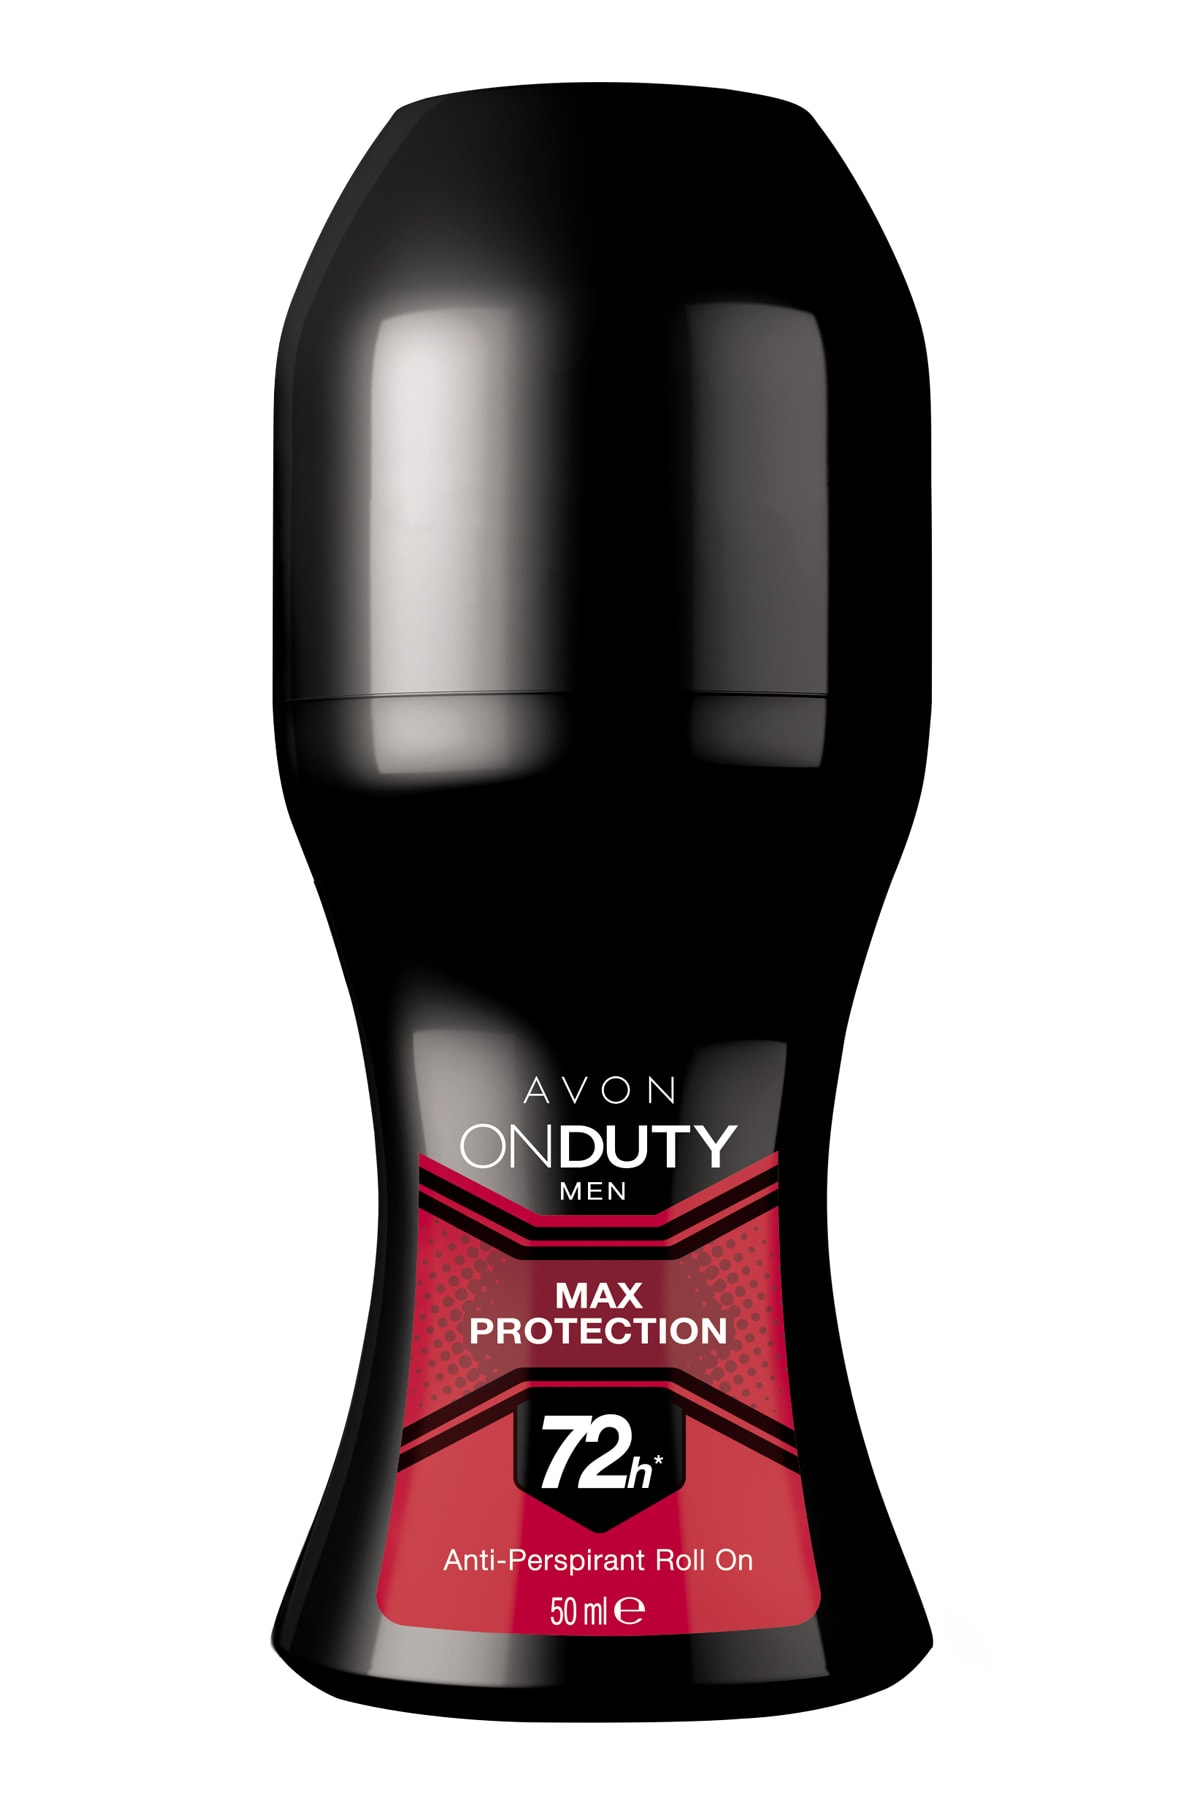 AVON On Duty Max Protection Antiperspirant Erkek Roll-On Deodorant - 50ml 1